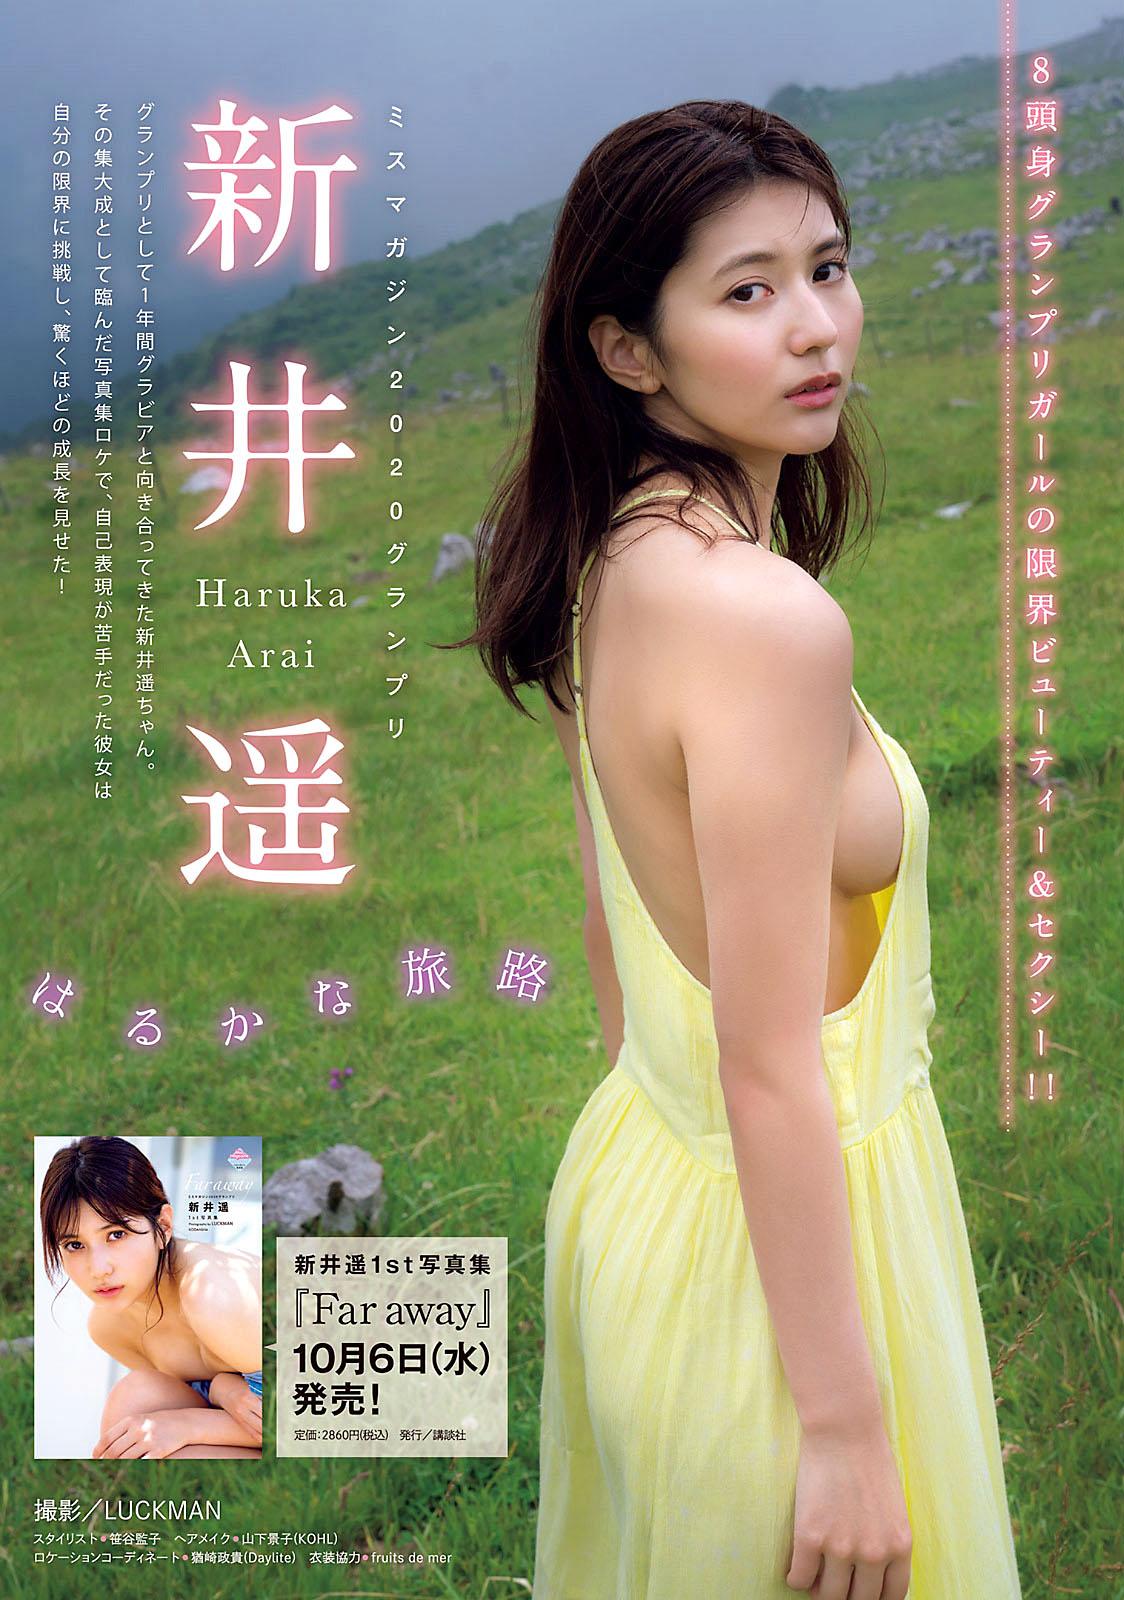 Haruka Arai Young Magazine 211018 02.jpg